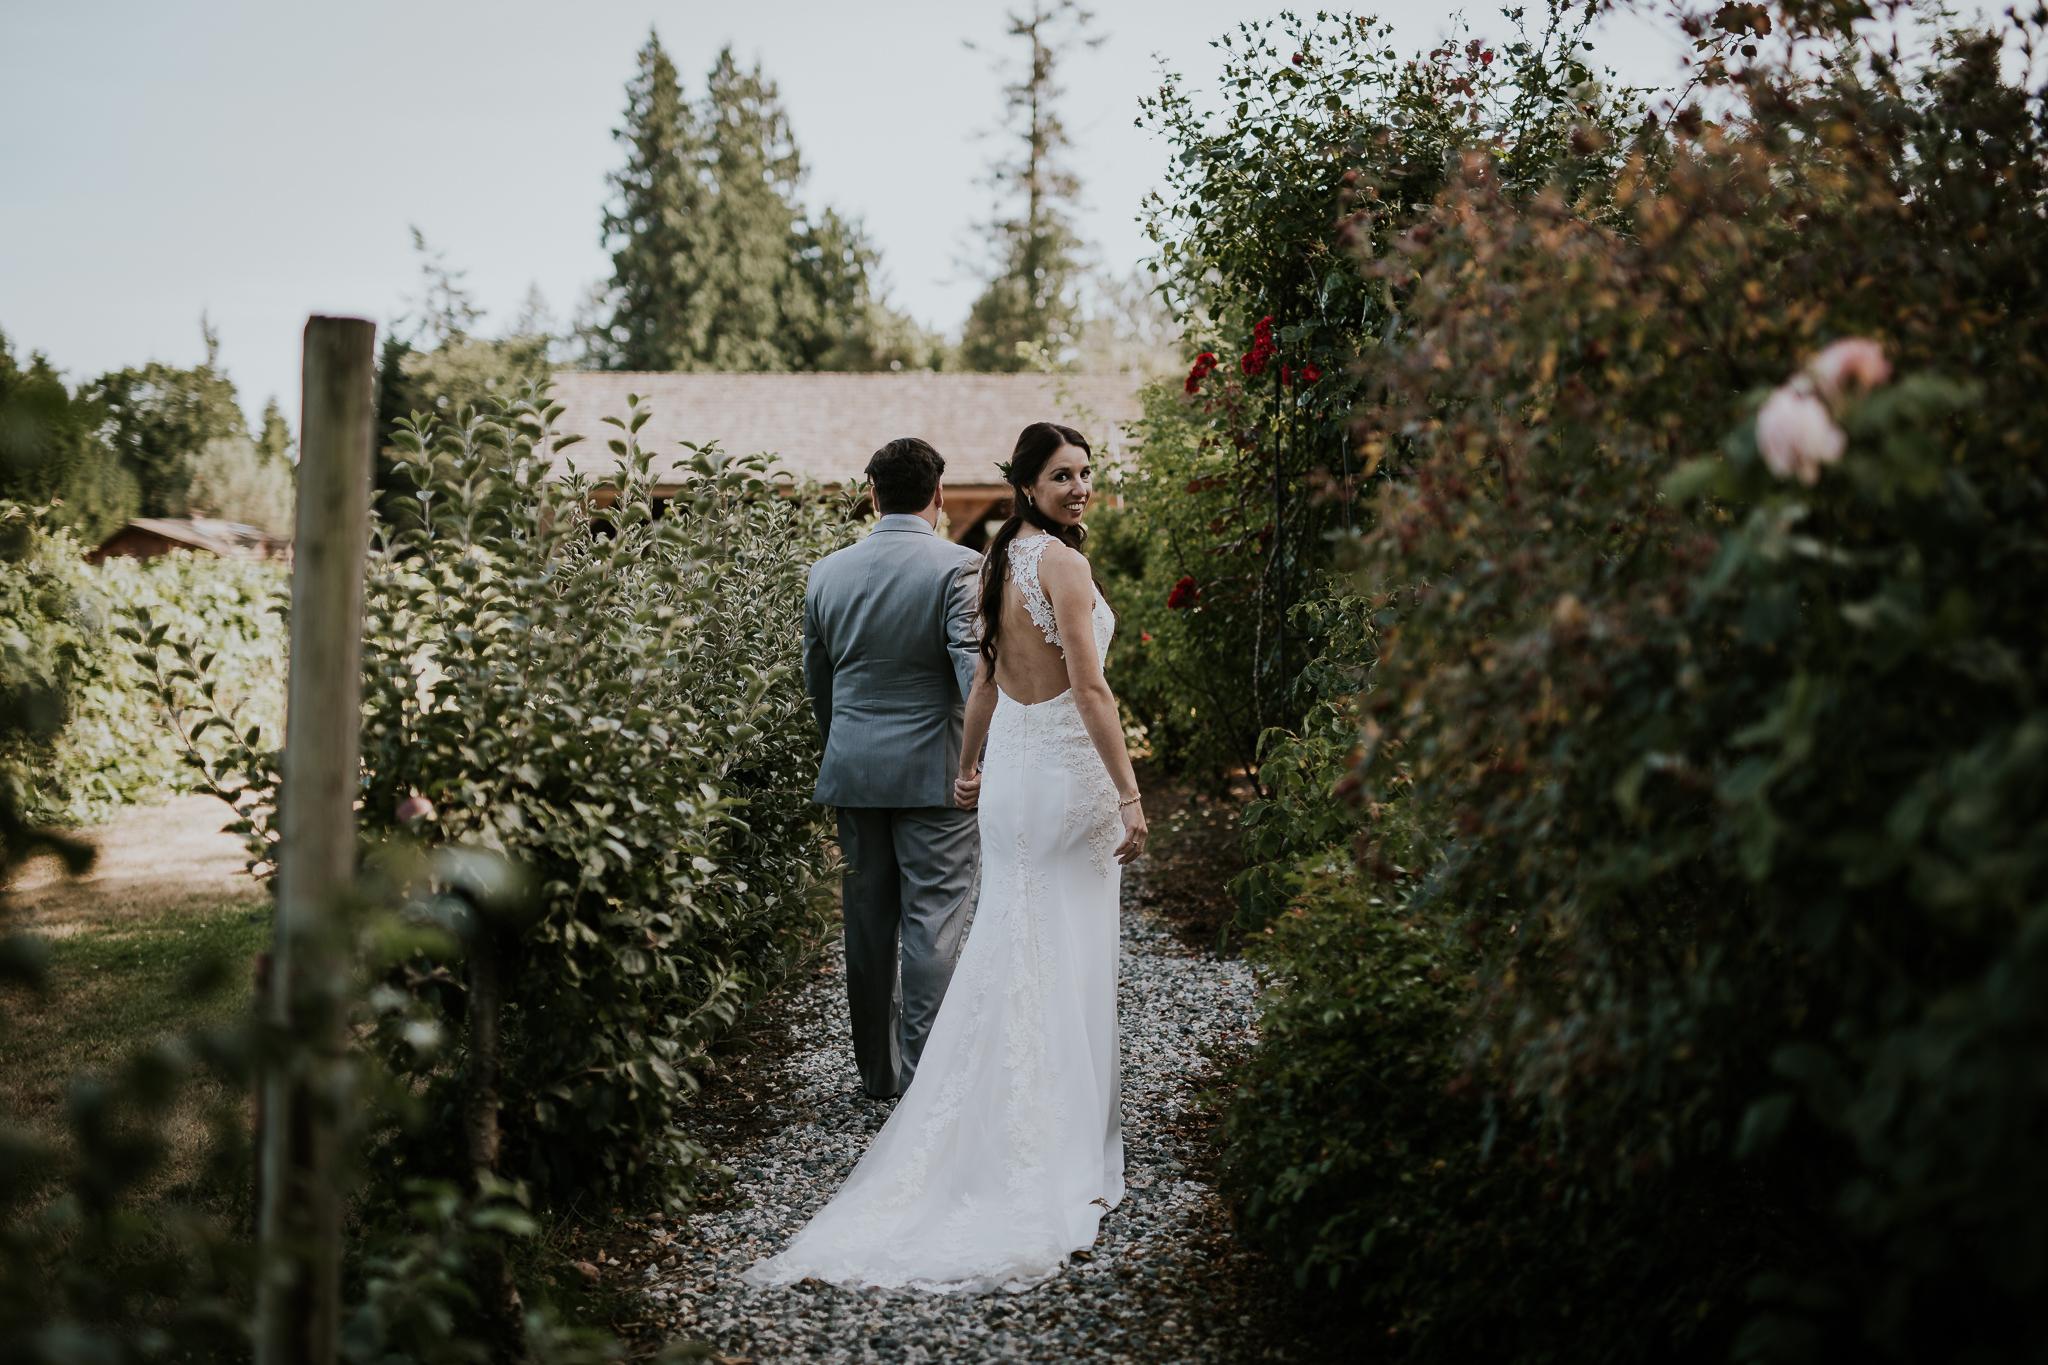 Bride and groom walking between rose bushes at vineyard Victoria BC wedding